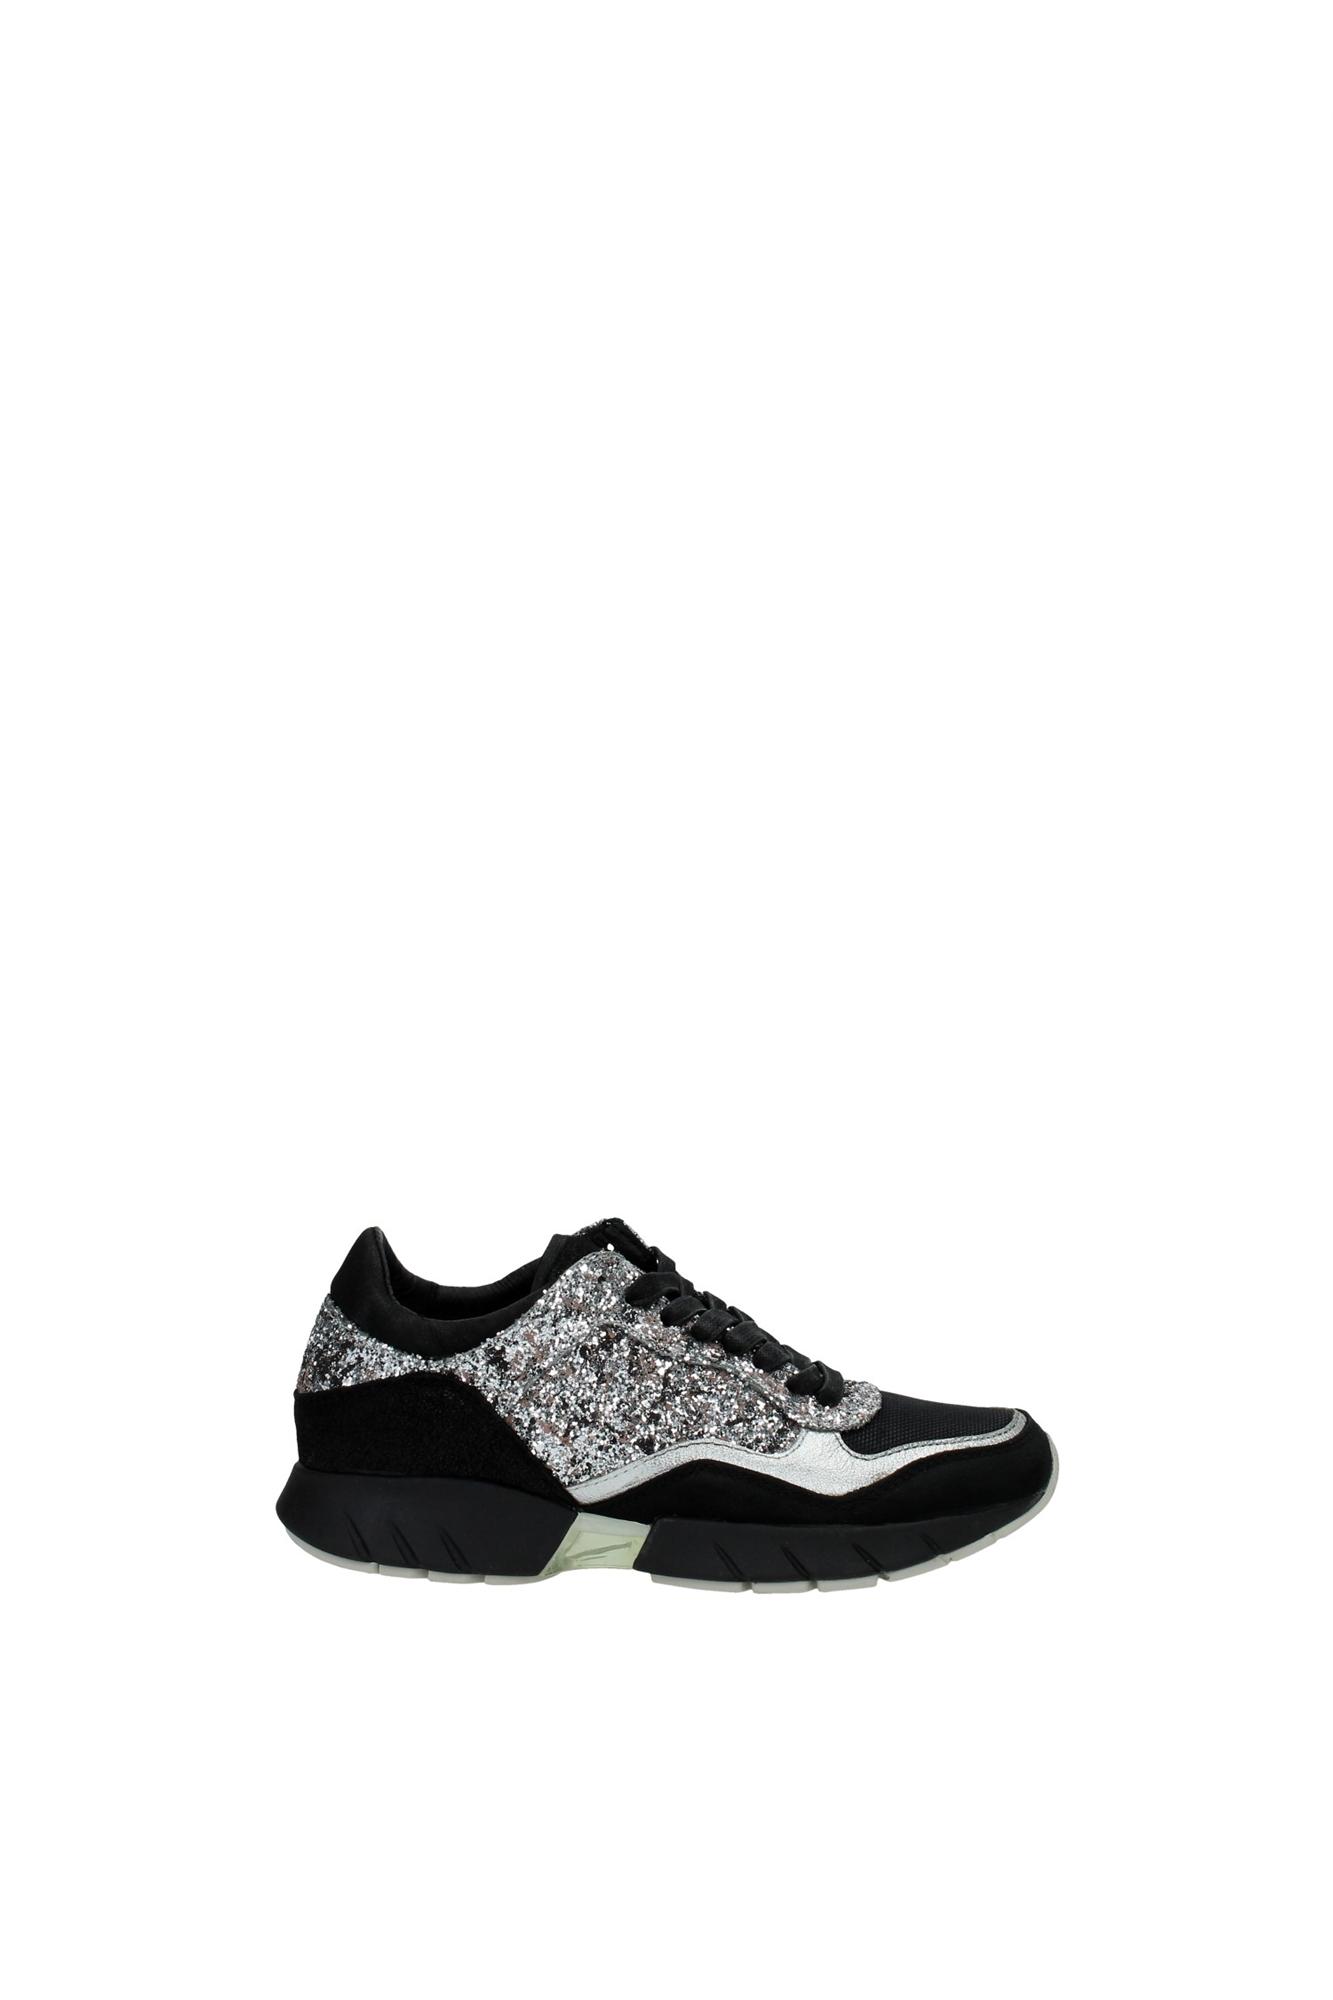 sneakers crime damen glitter silber 25158a15b88 ebay. Black Bedroom Furniture Sets. Home Design Ideas